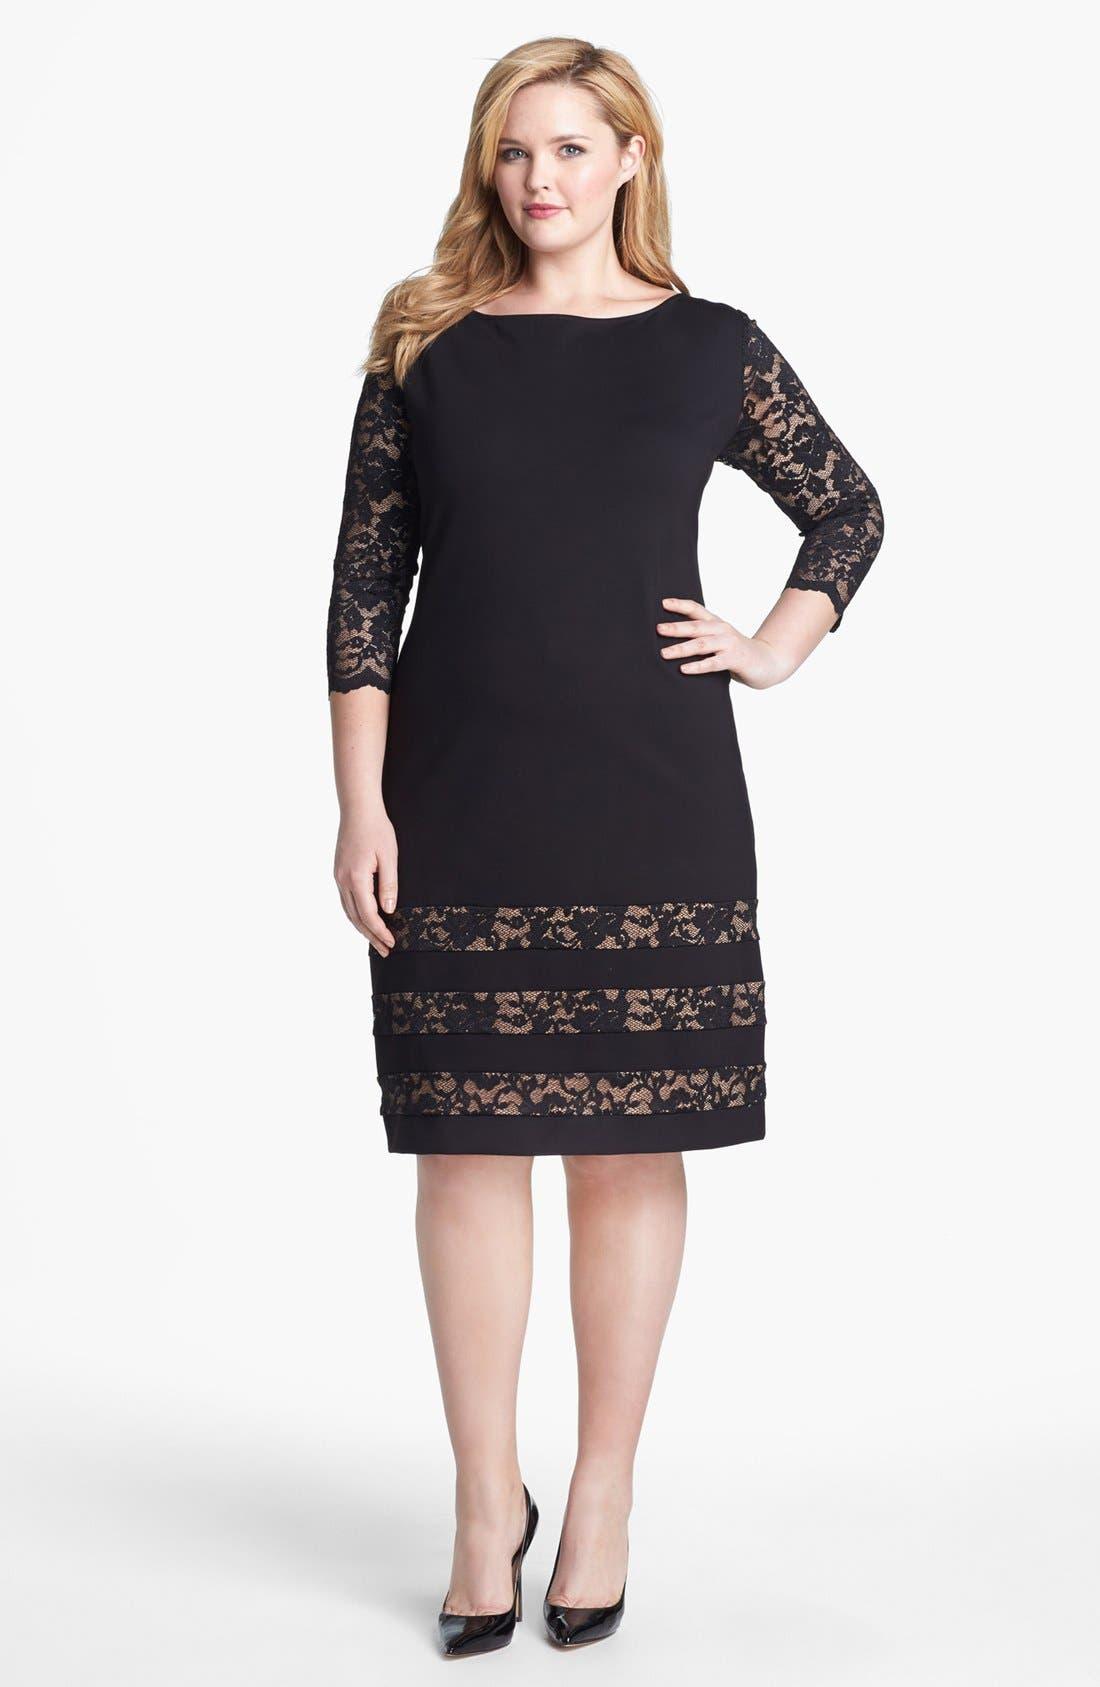 Alternate Image 1 Selected - ABS by Allen Schwartz Lace Detail Sheath Dress (Plus Size)